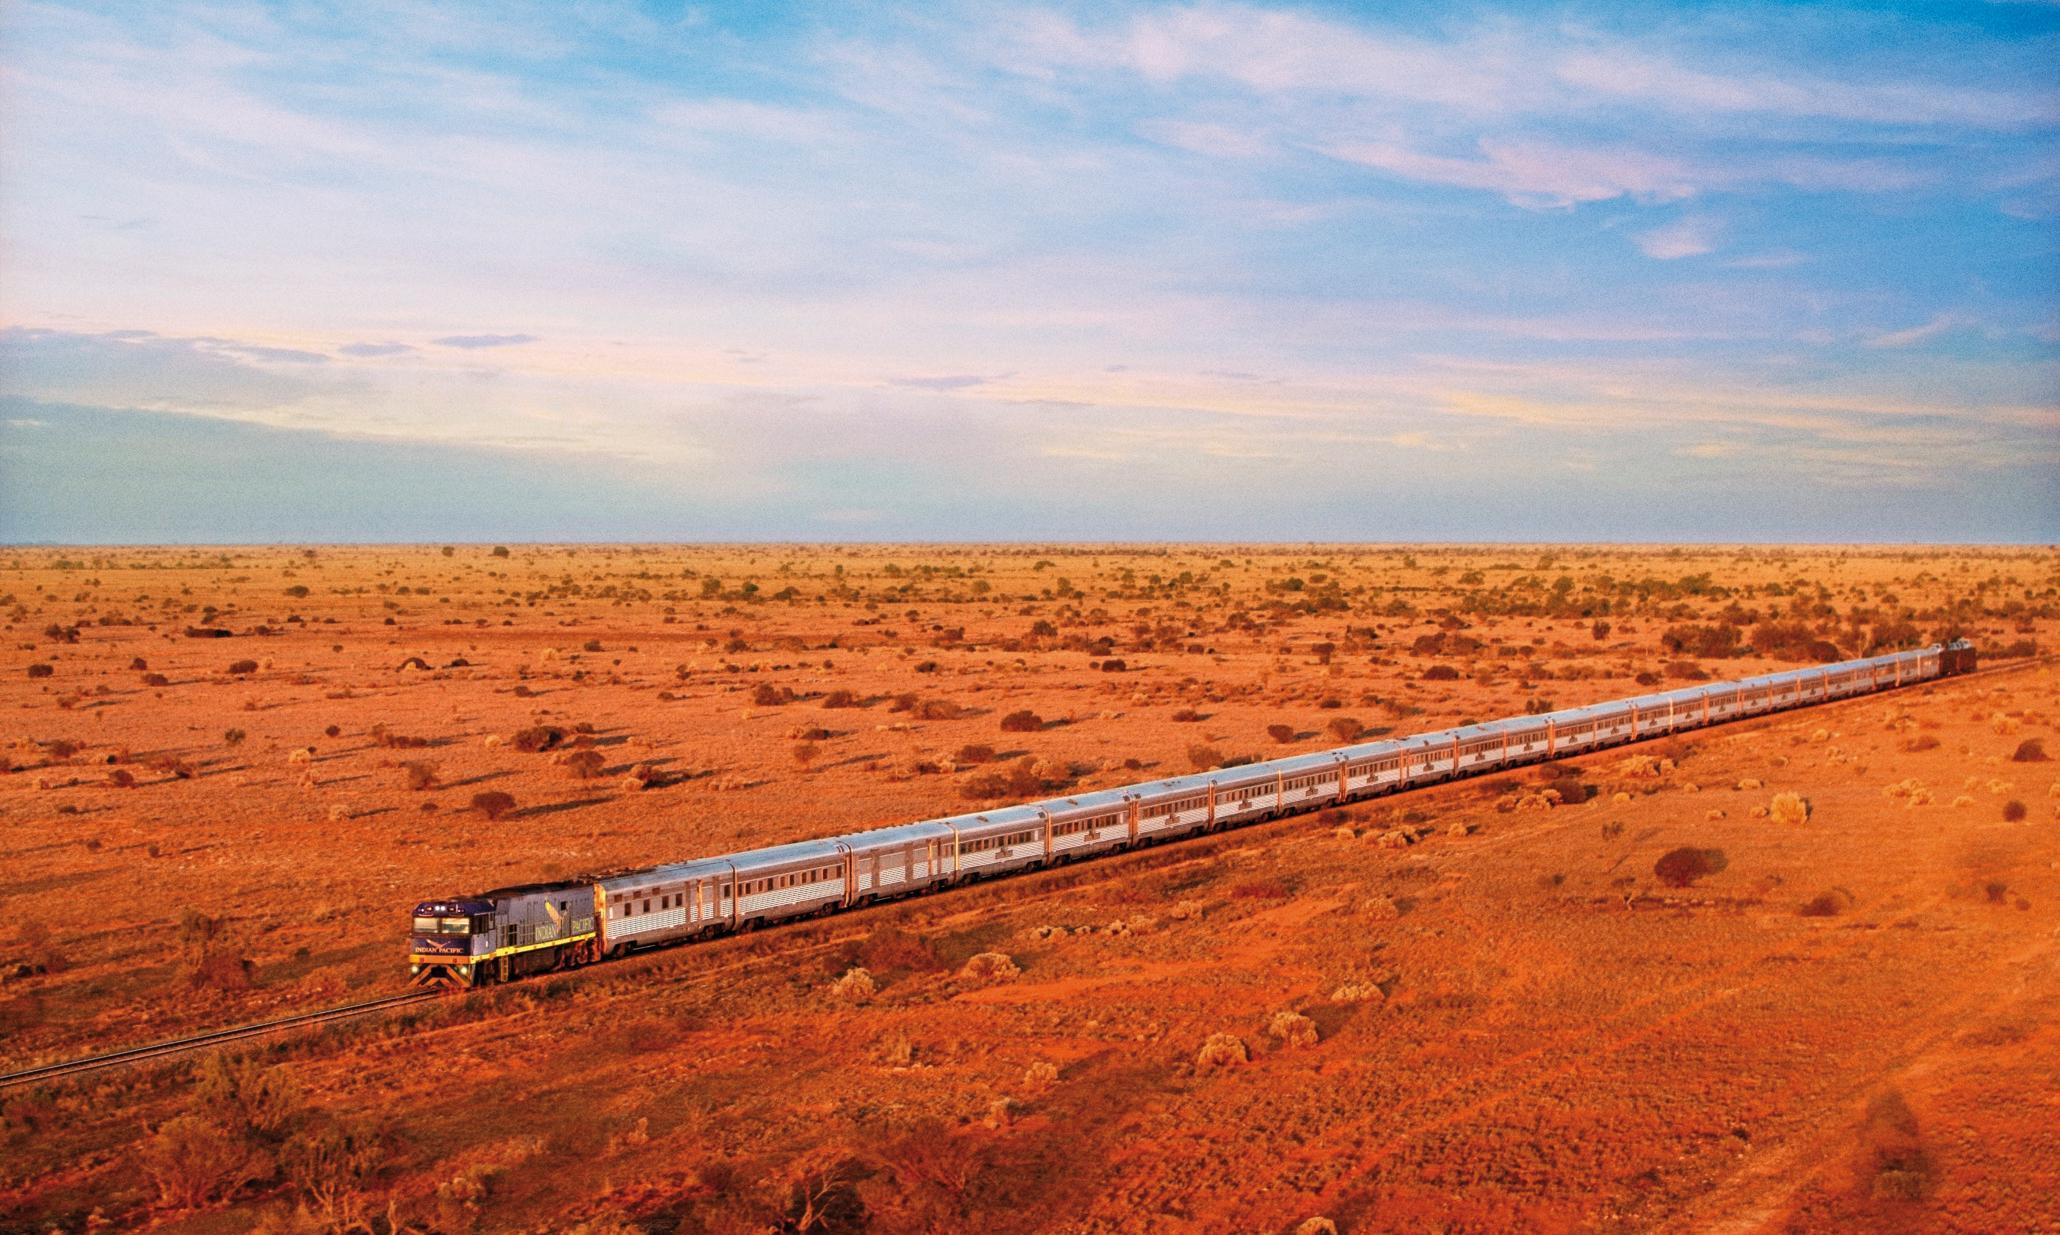 Gastro outbreak strikes more than 100 passengers on Sydney to Perth train